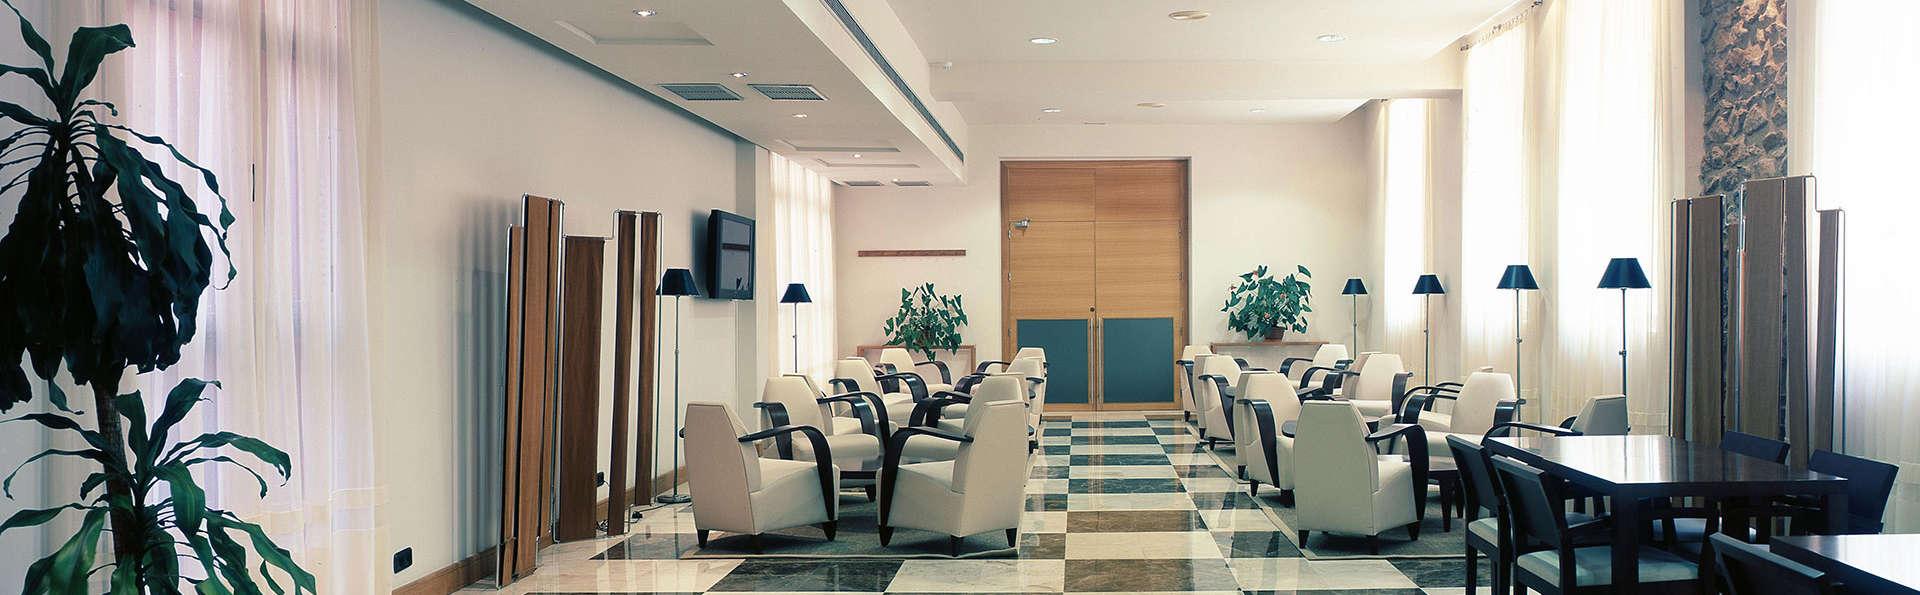 Balneario de Archena - Hotel Levante - edit_salon.jpg